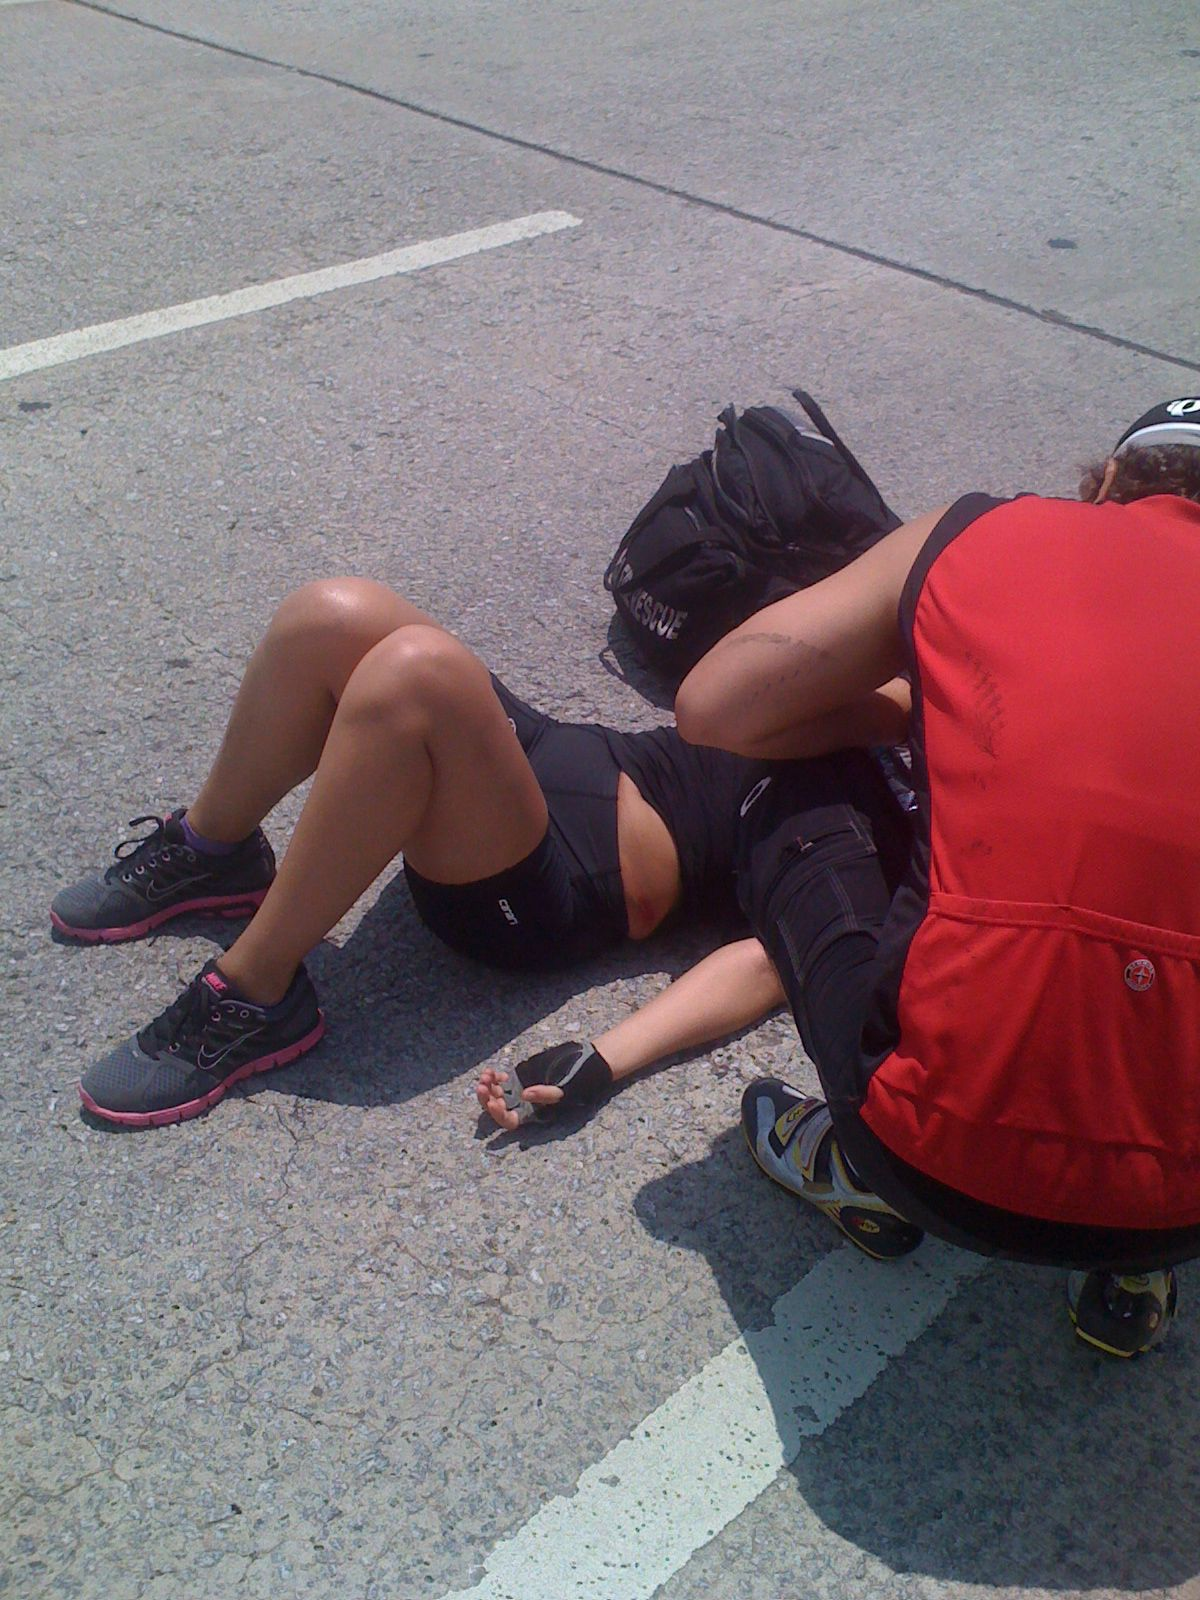 cyclist wreck